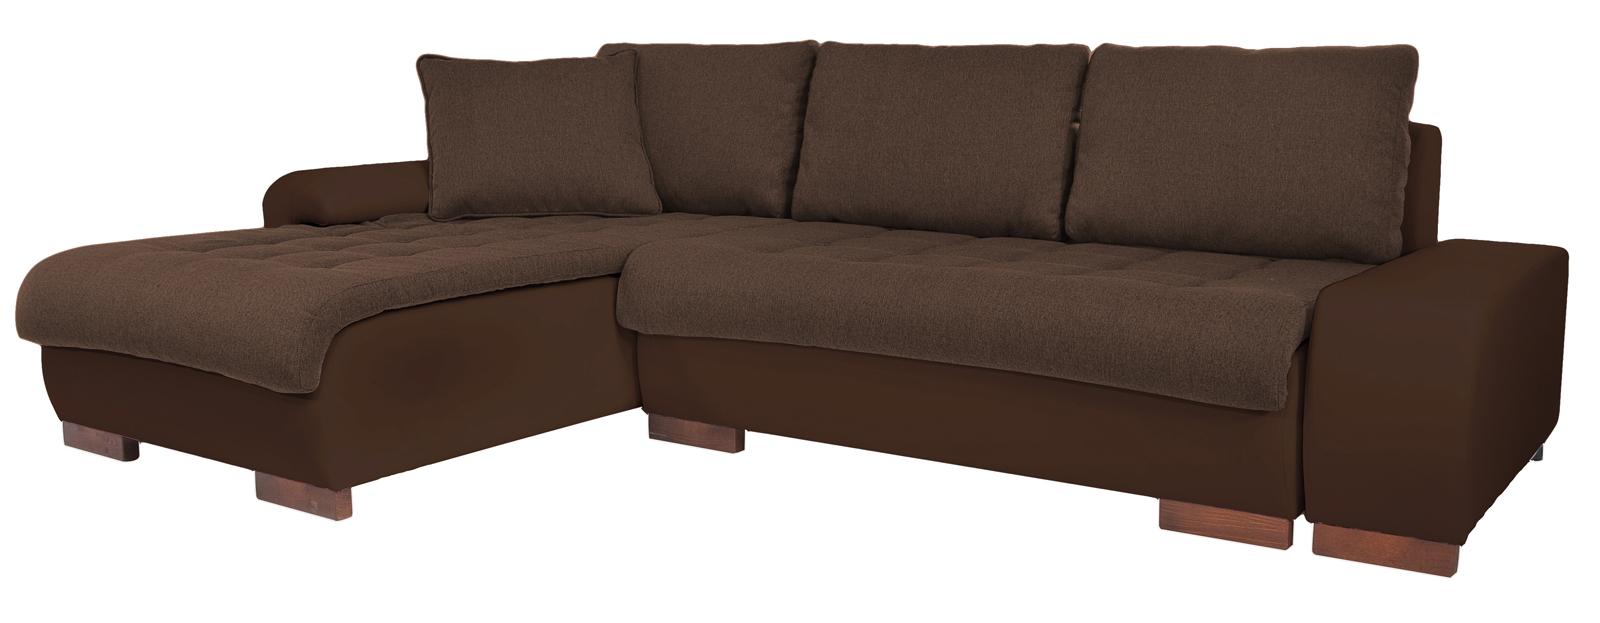 Rohová sedačka - Famm - Florenz Bis 2 (L)